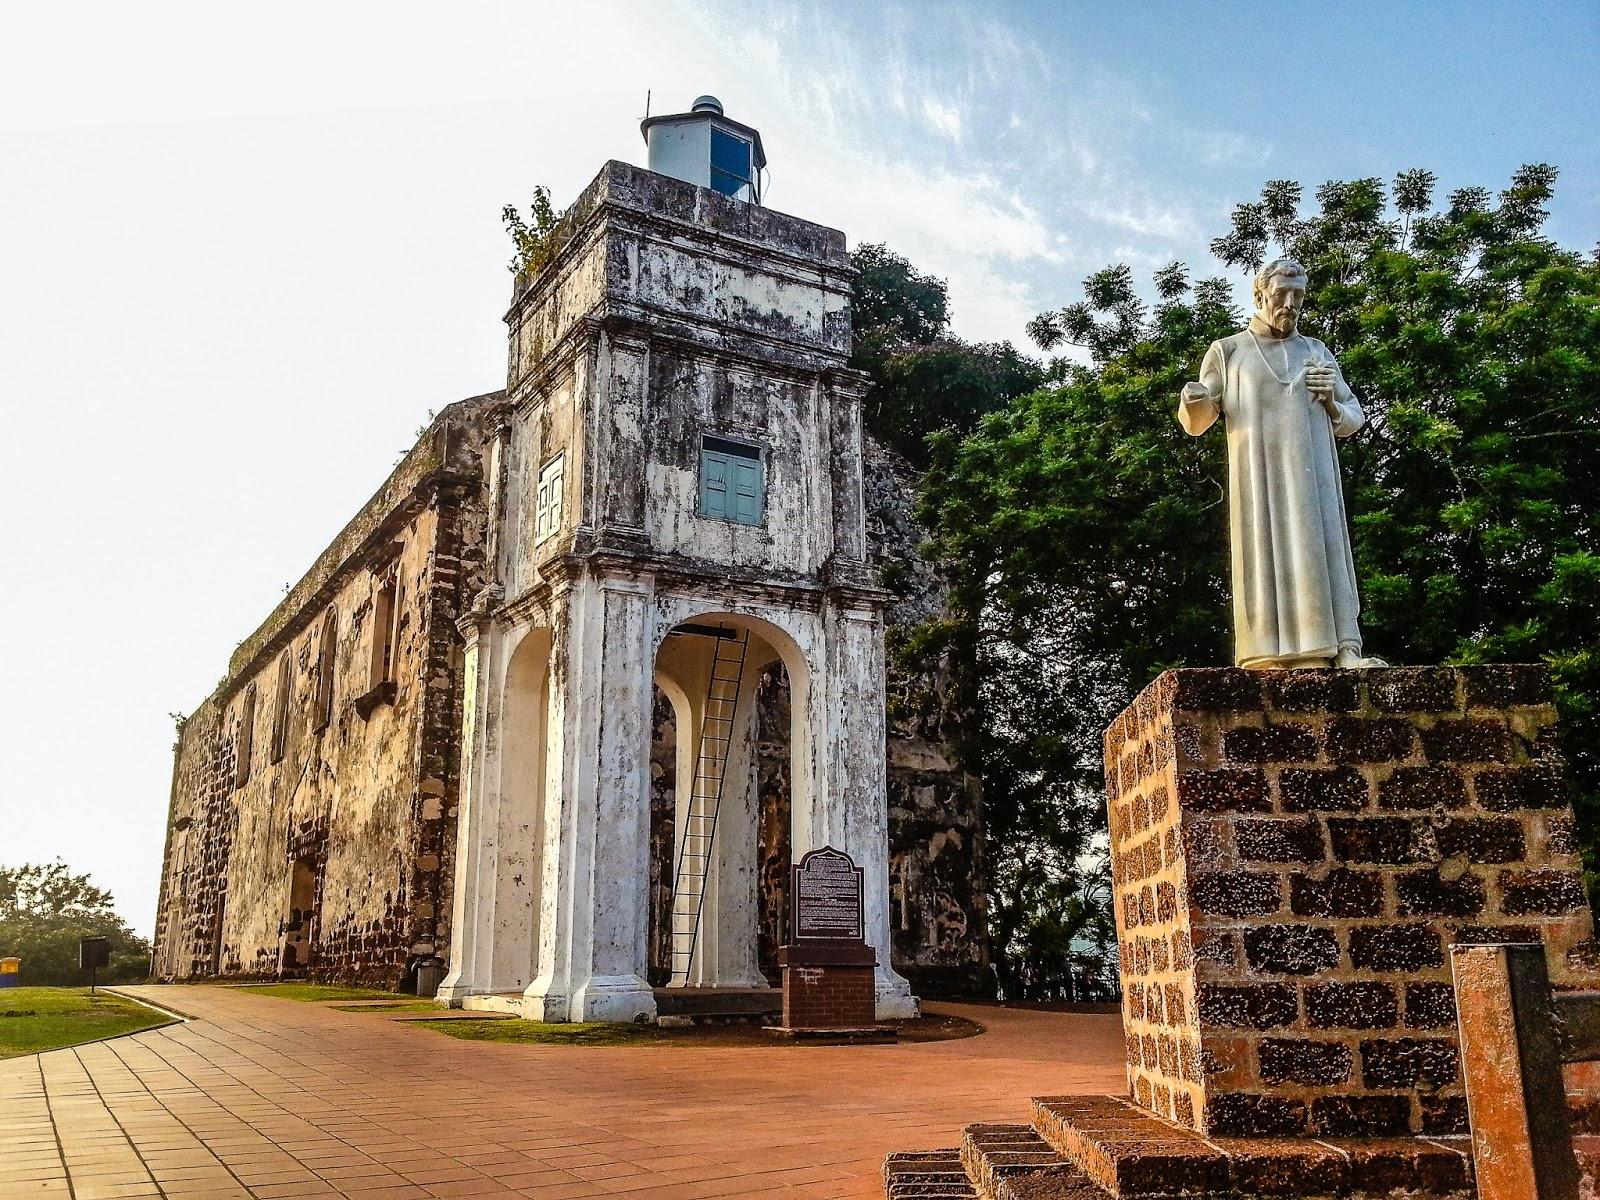 Highlights of Malaysia, Malacca, St Paul's Church